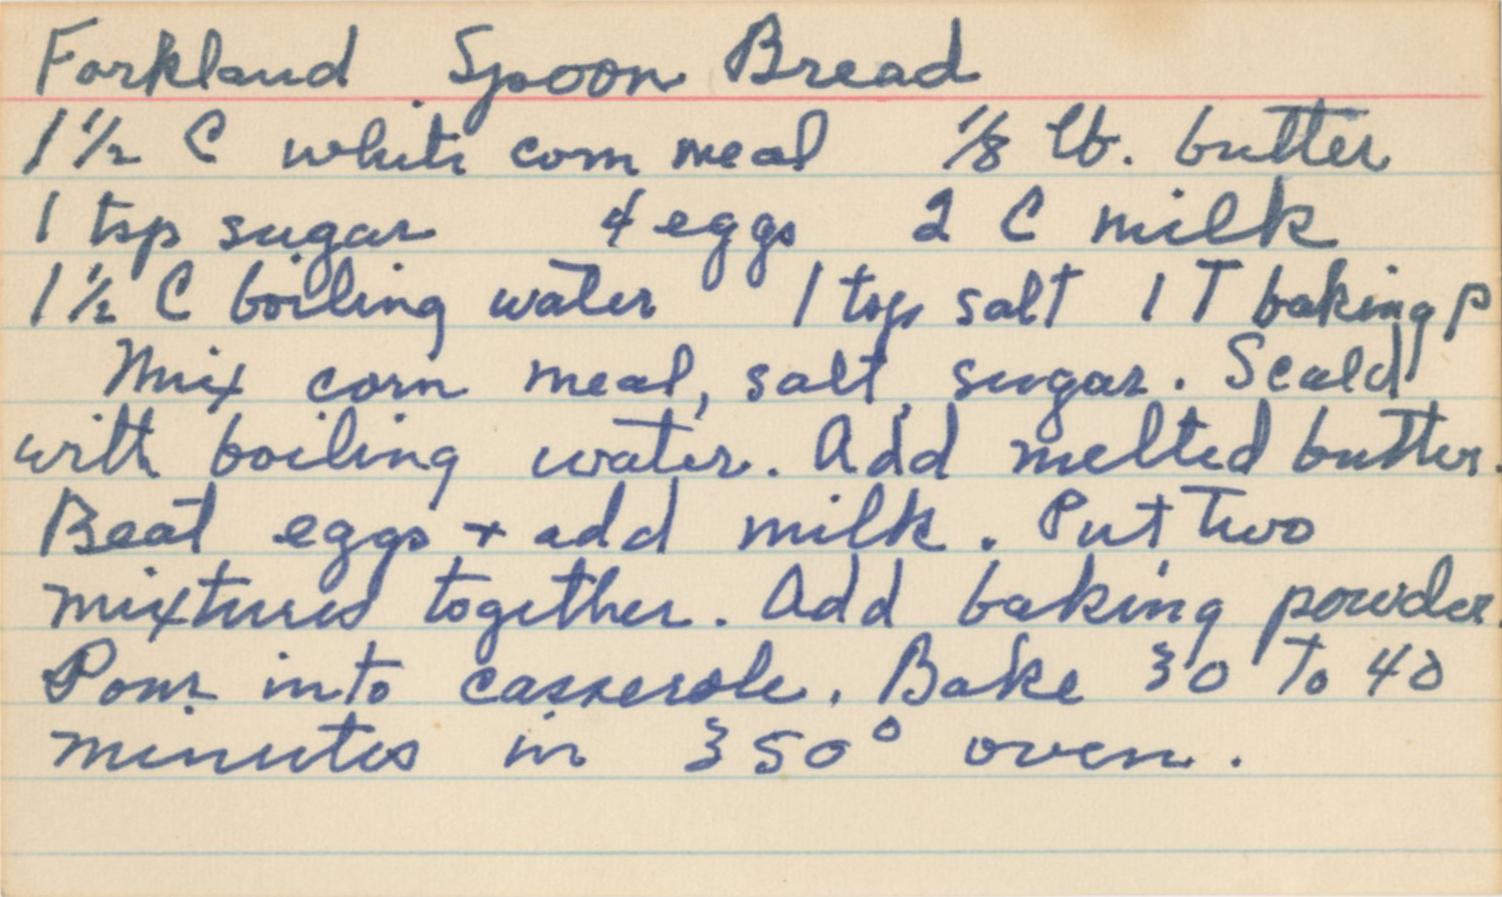 Forkland Spoon Bread